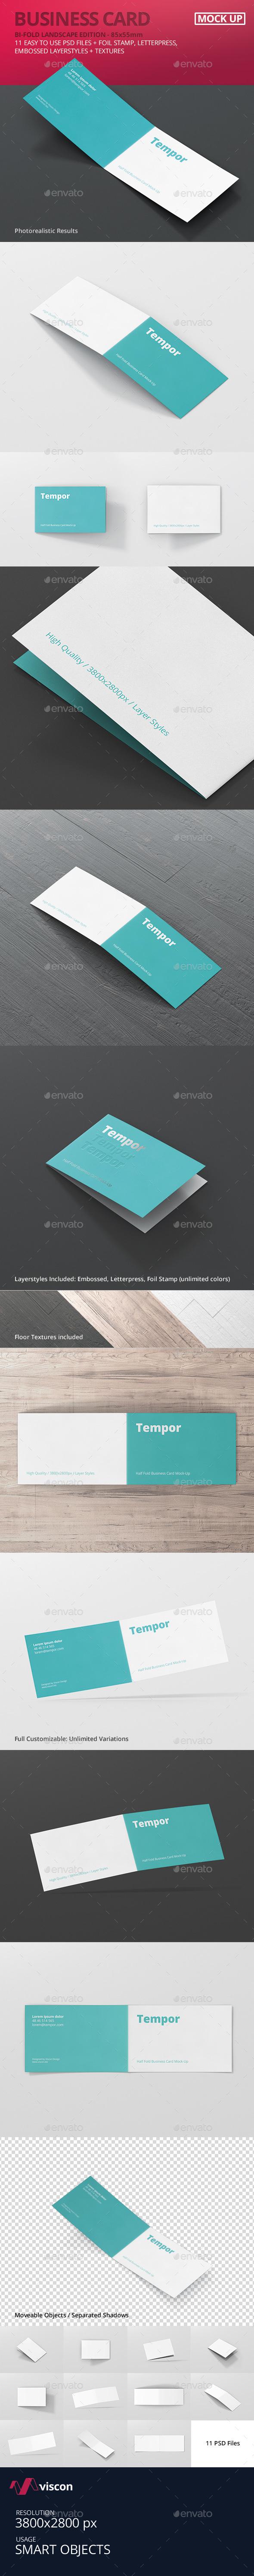 Folded Business Card Mockup - Business Cards Print